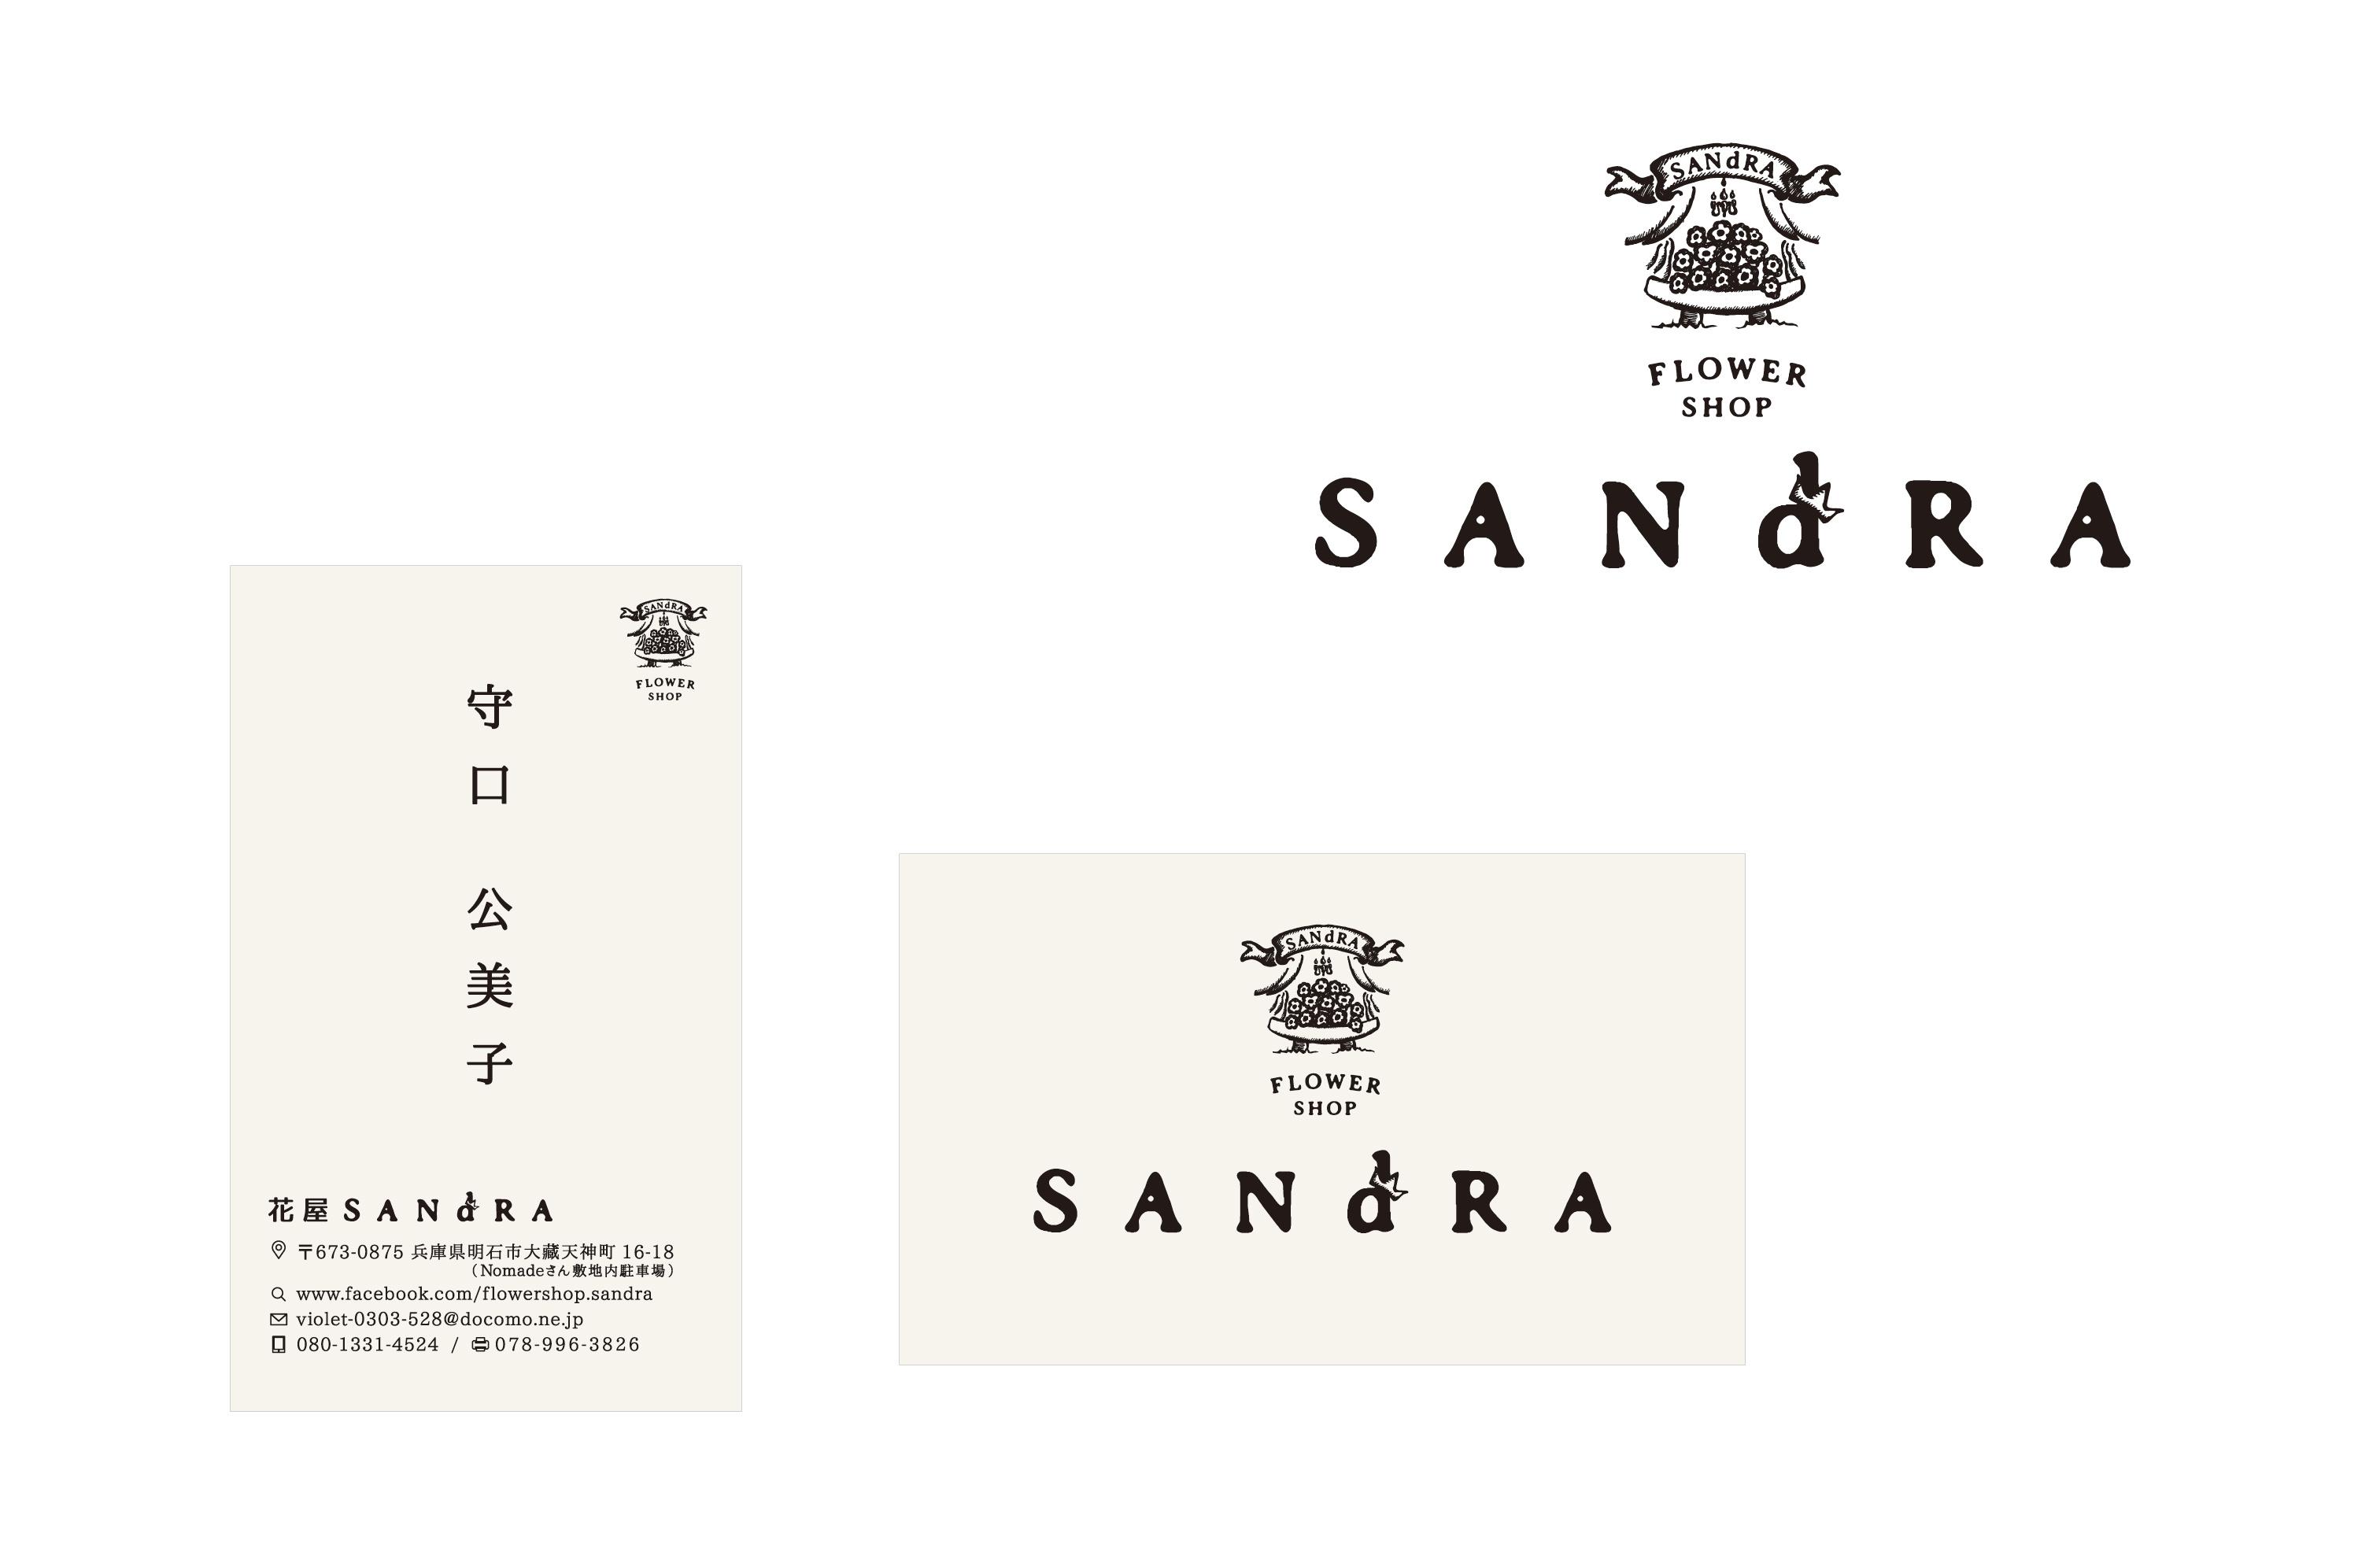 SANdRA_BusinessCard_DECISION_20150721